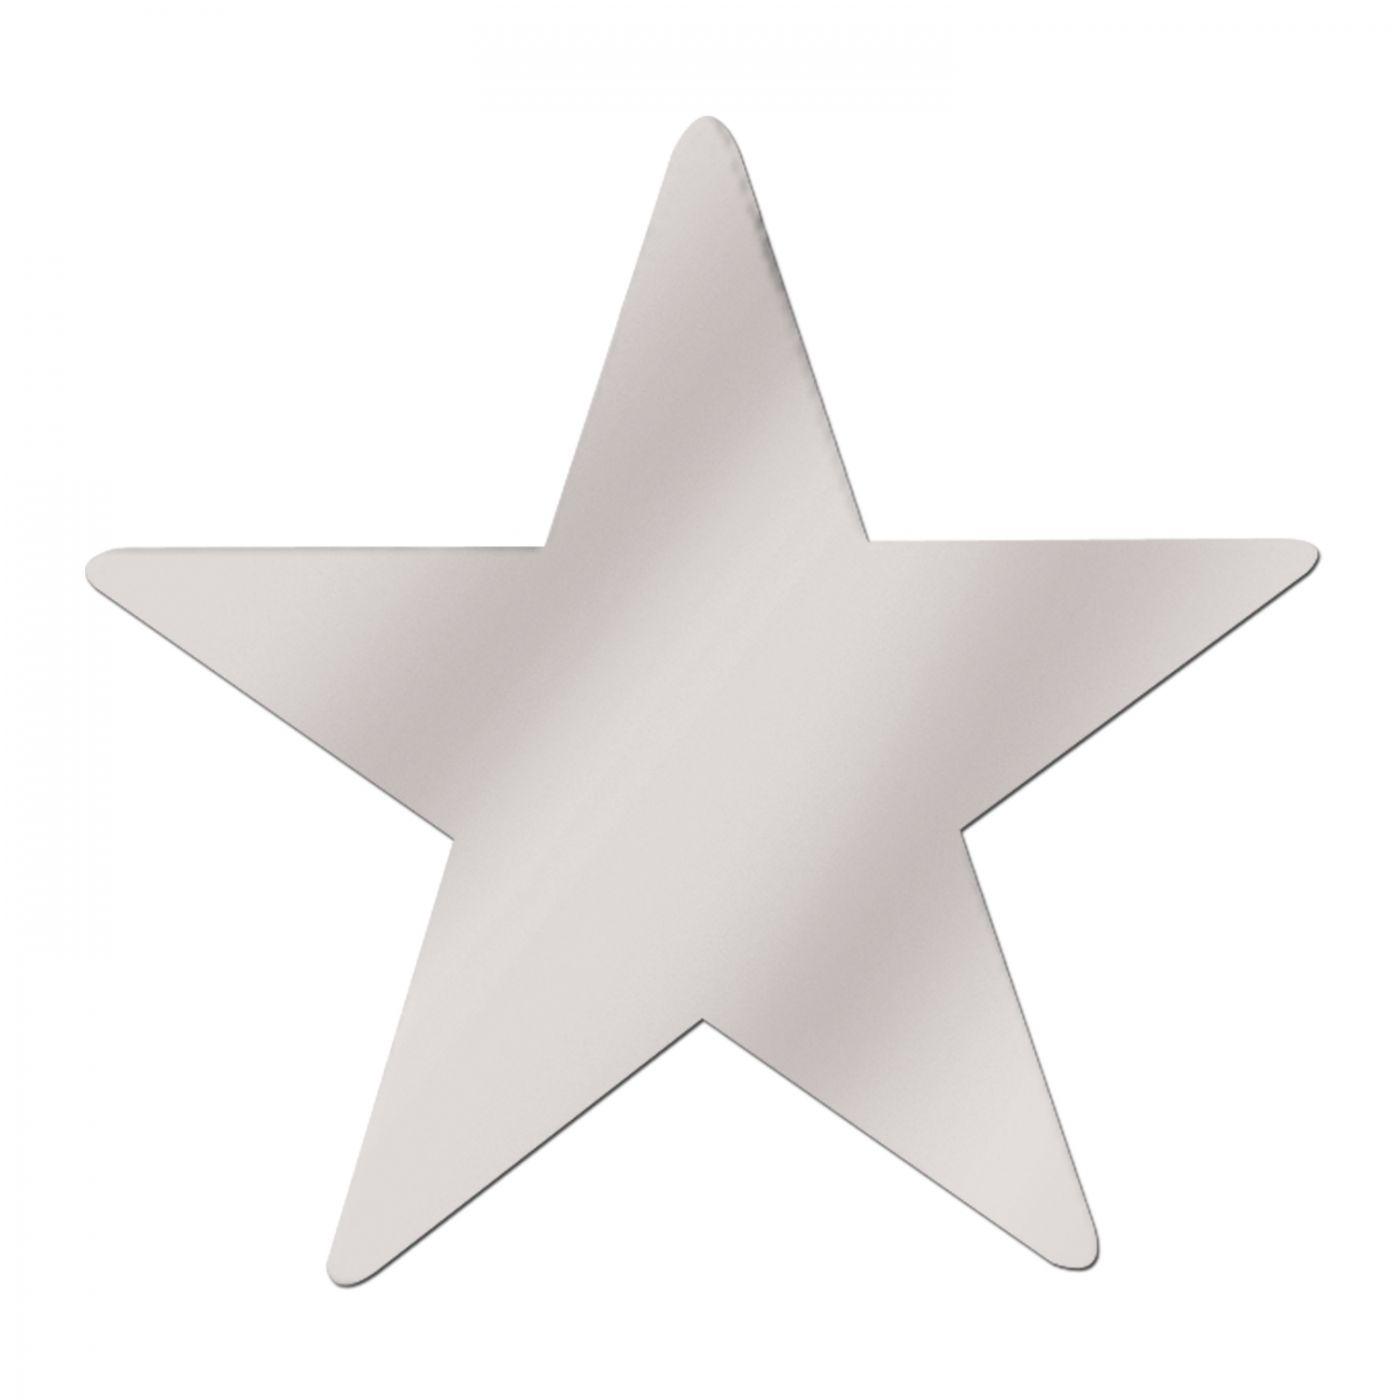 Jumbo Foil Star Cutout image